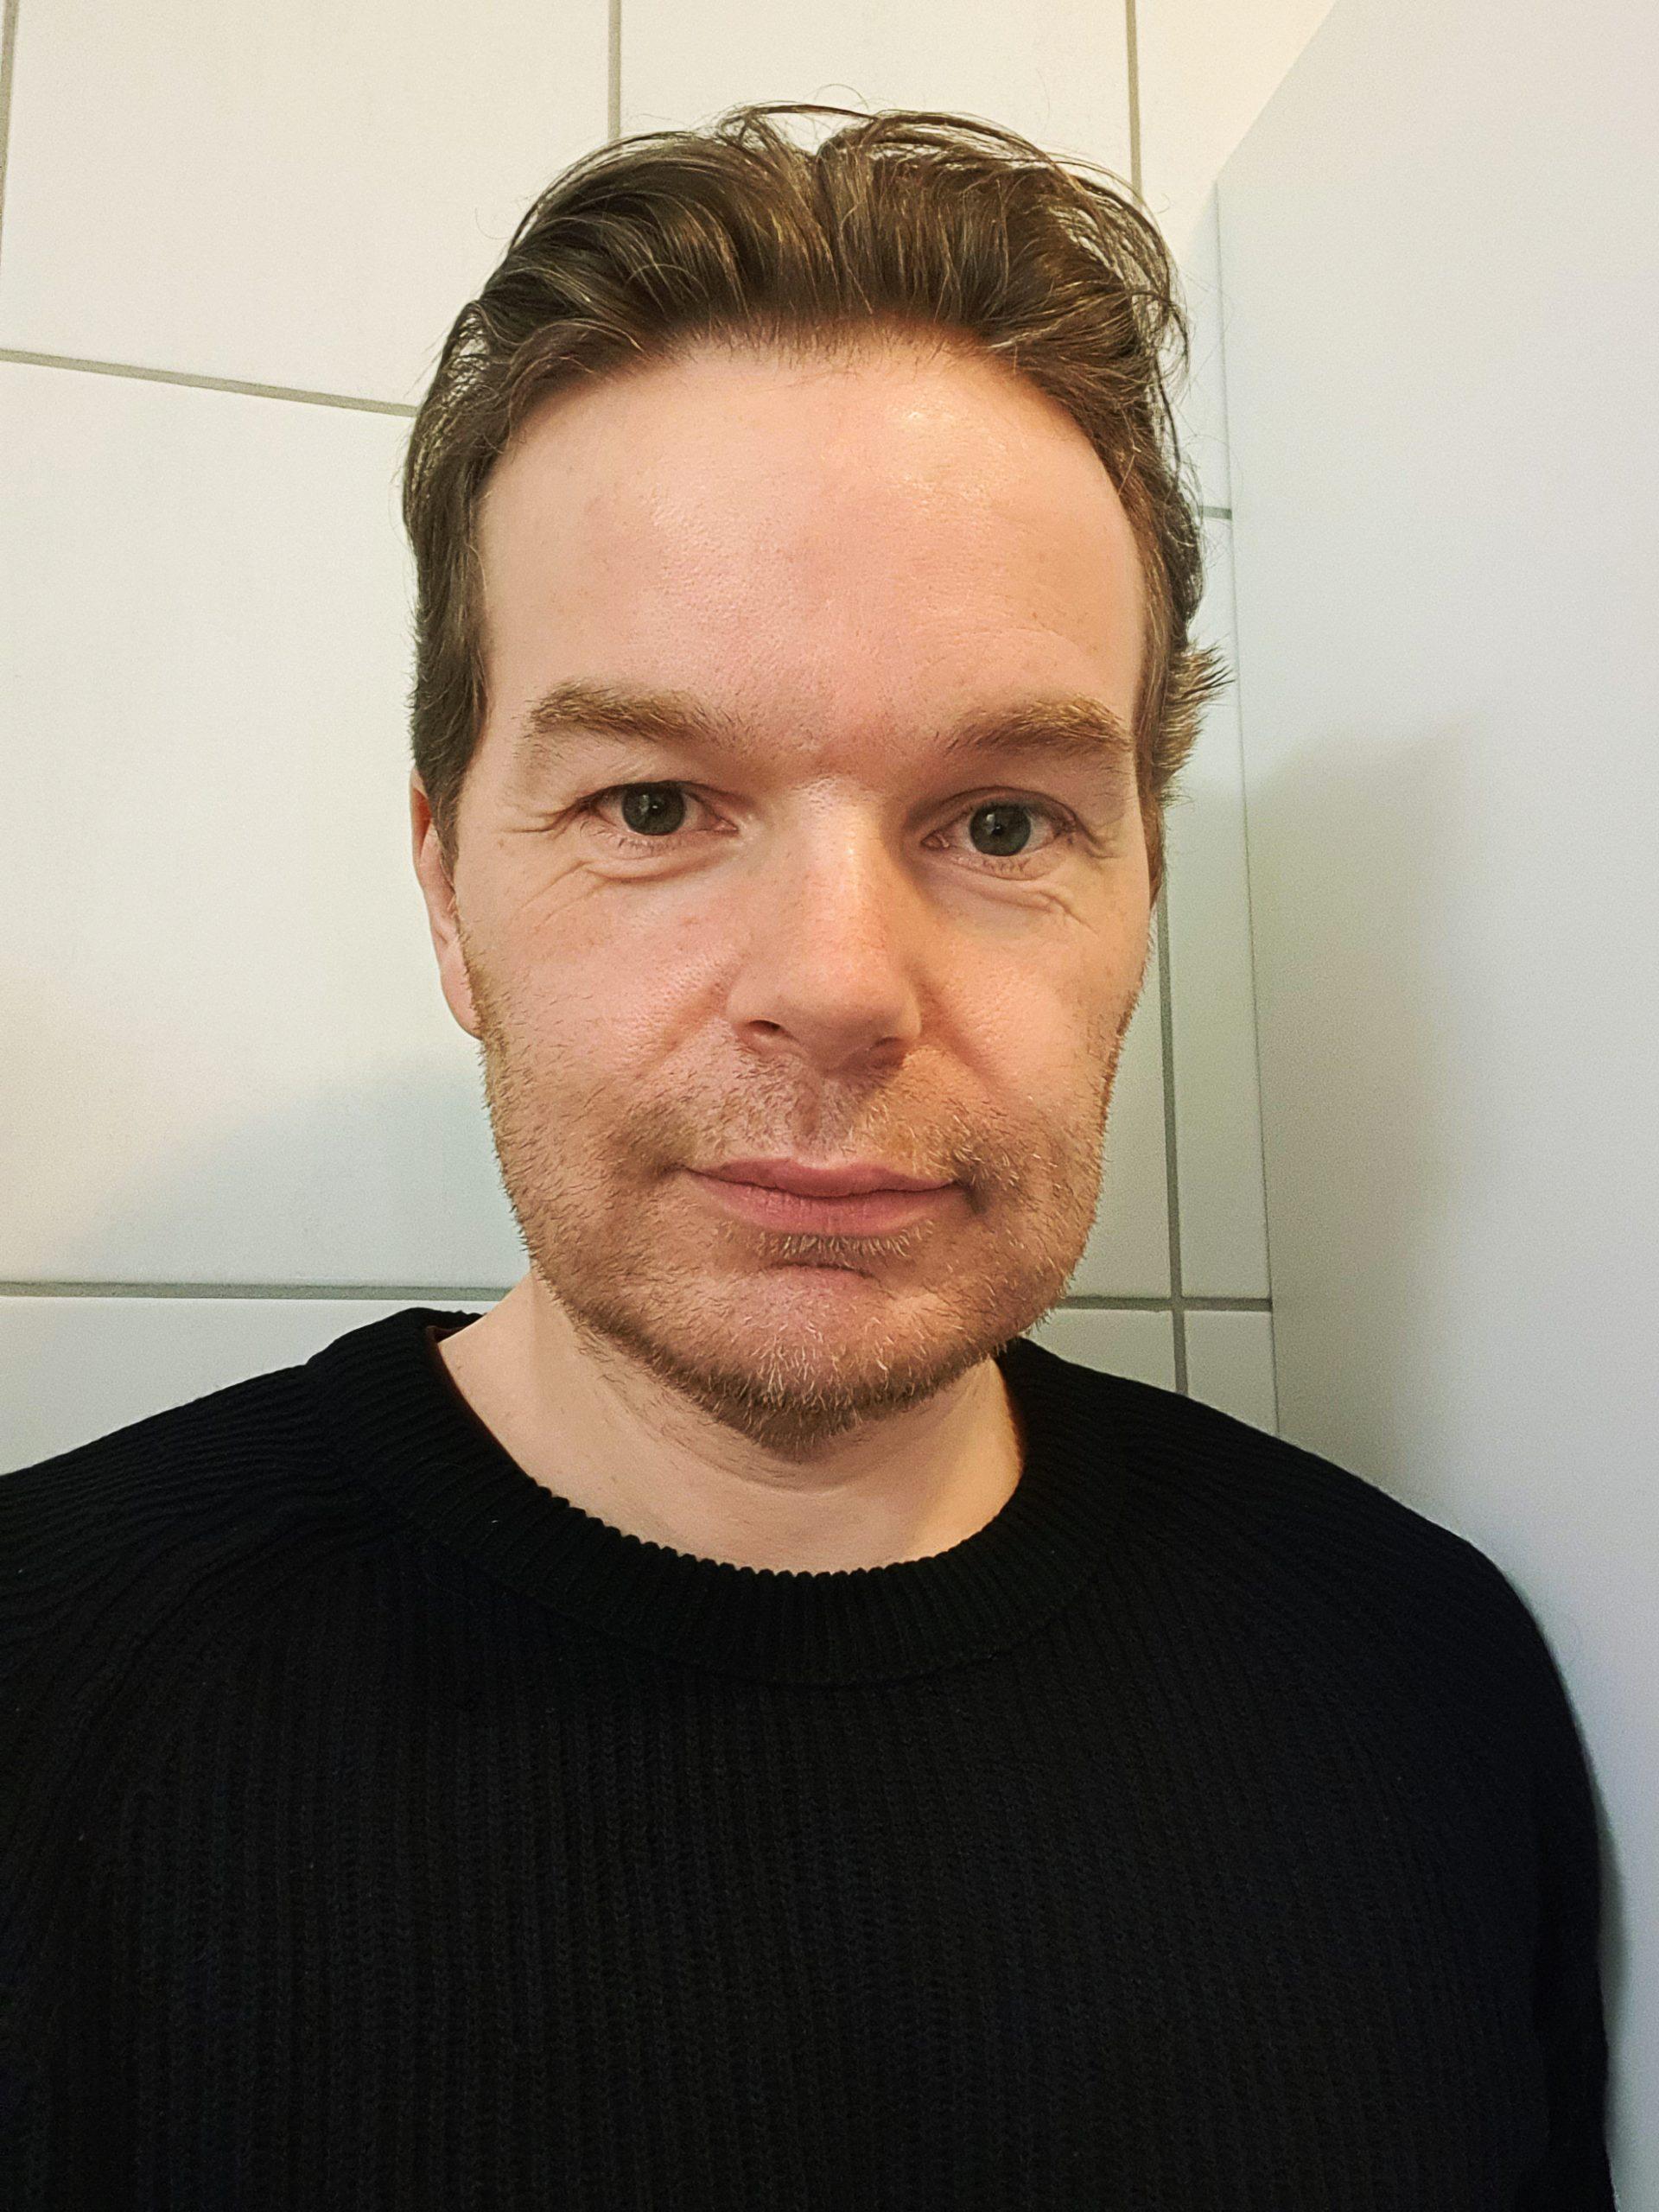 Hogne Pettersen